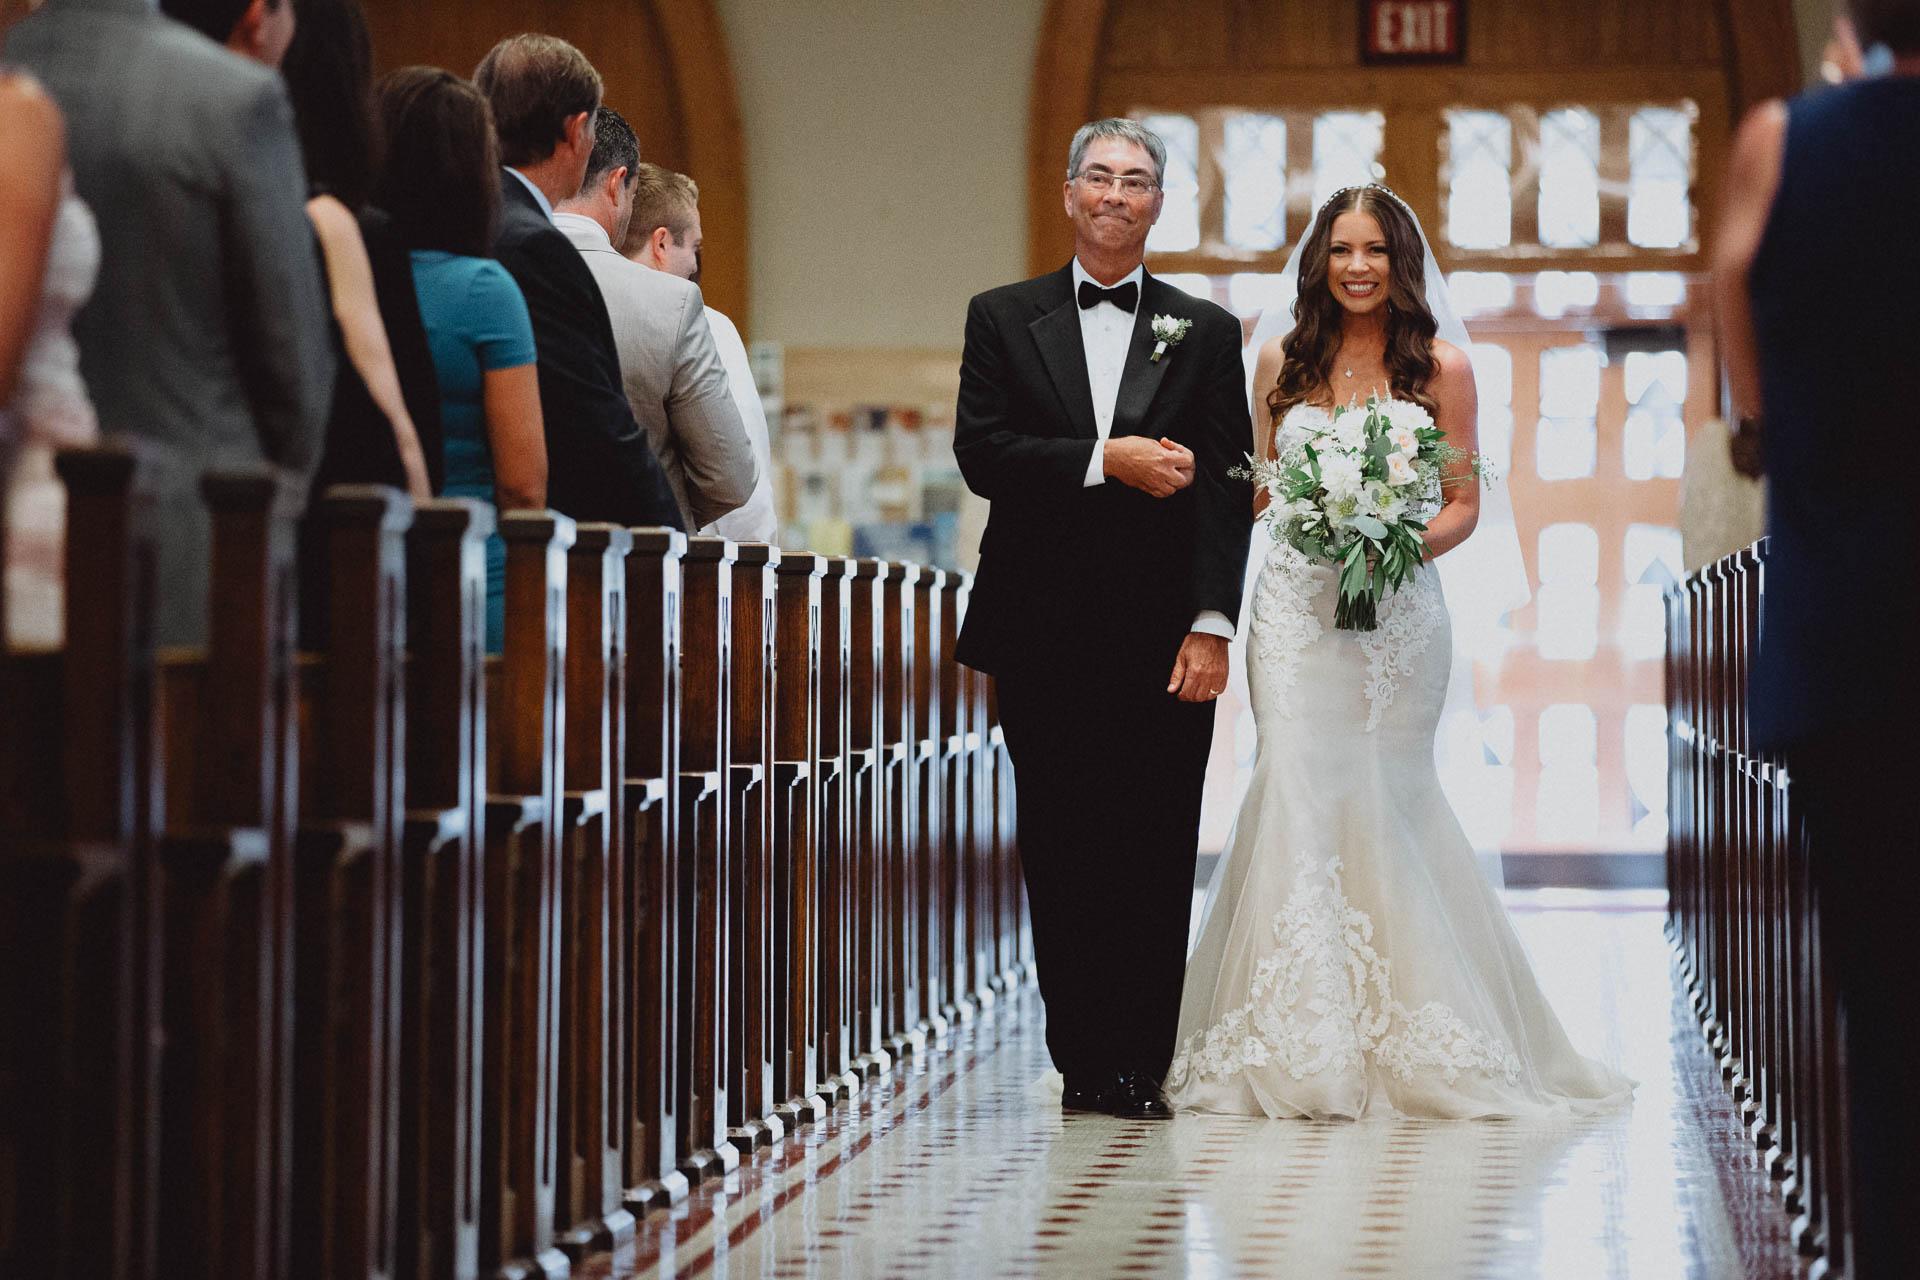 Keri-Joseph-Top-of-the-Market-Wedding-068@2x.jpg